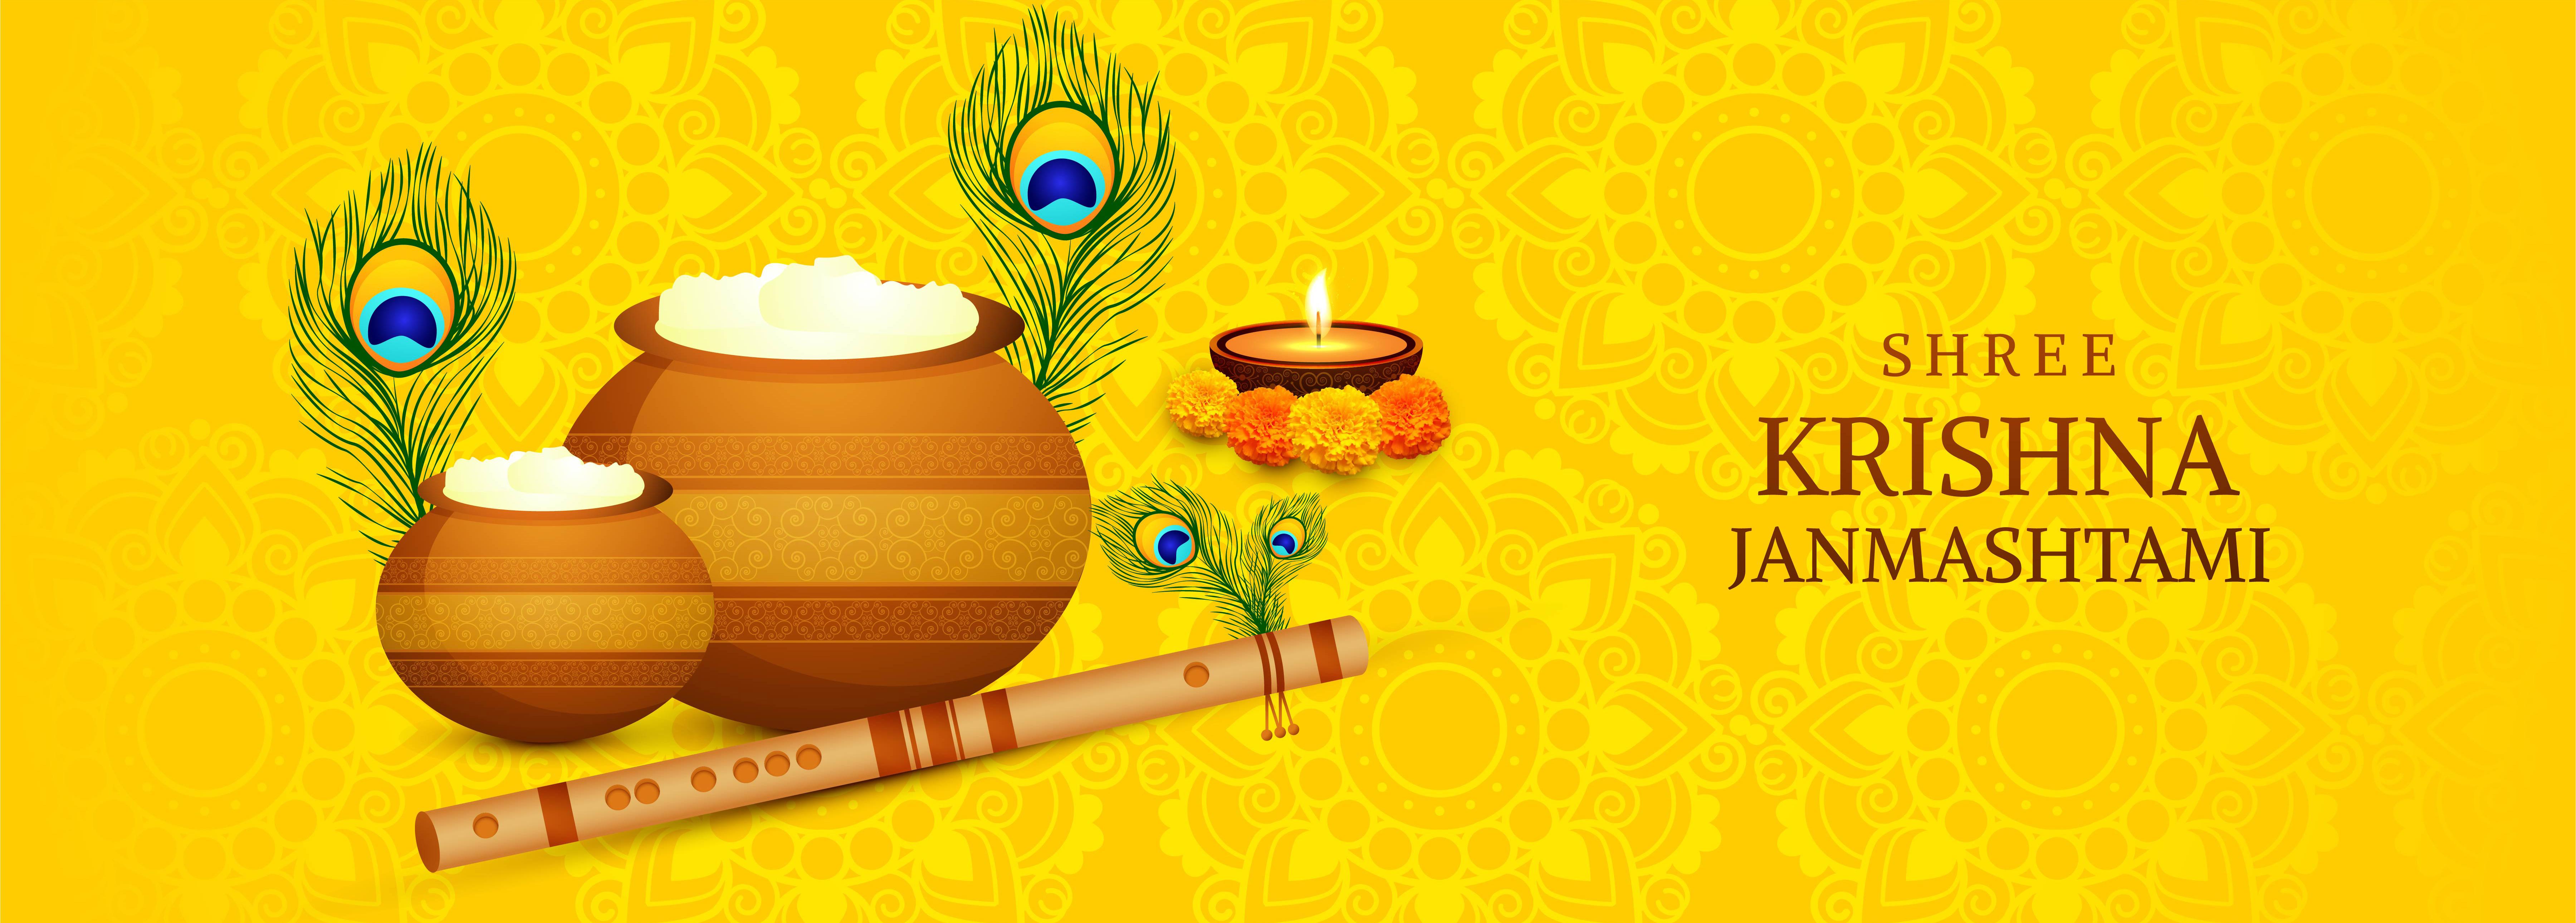 tarjeta del festival shree krishna janmashtami con banner de ollas